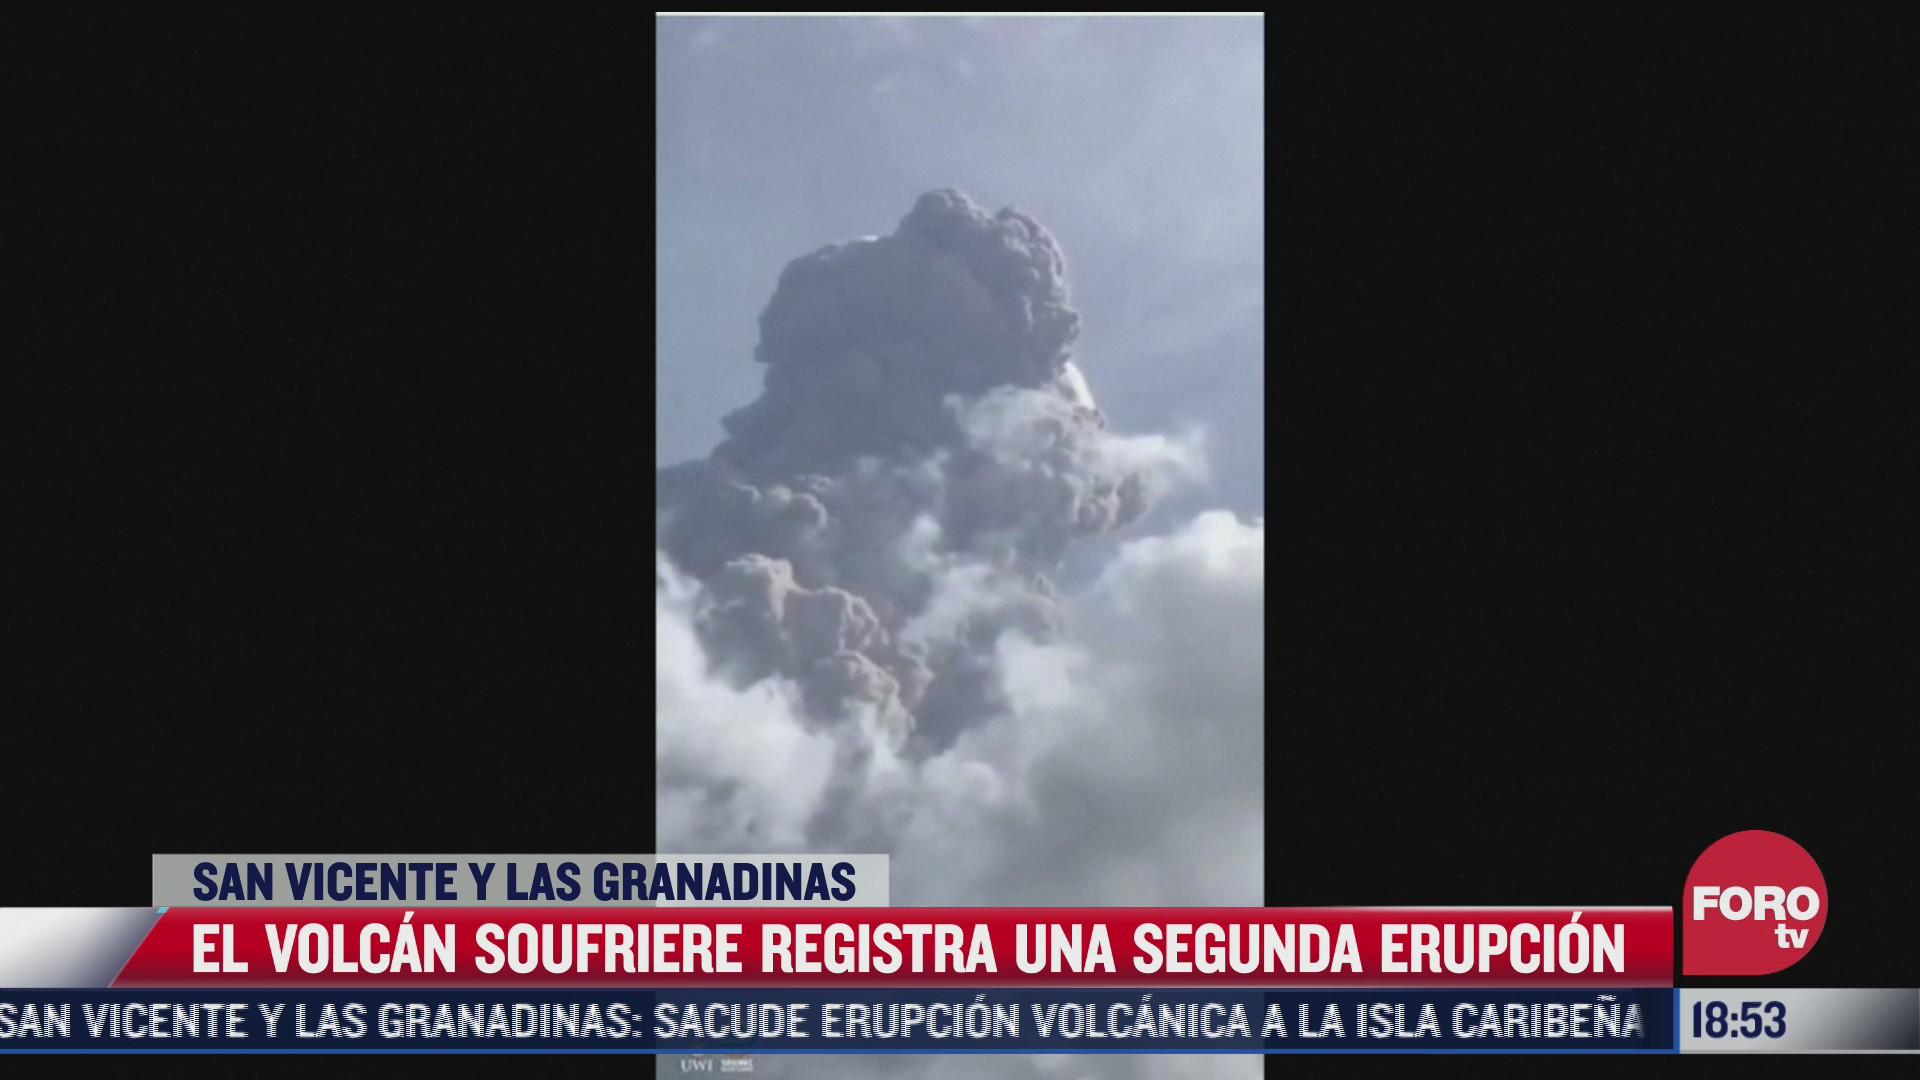 volcan soufriere registra segunda erupcion